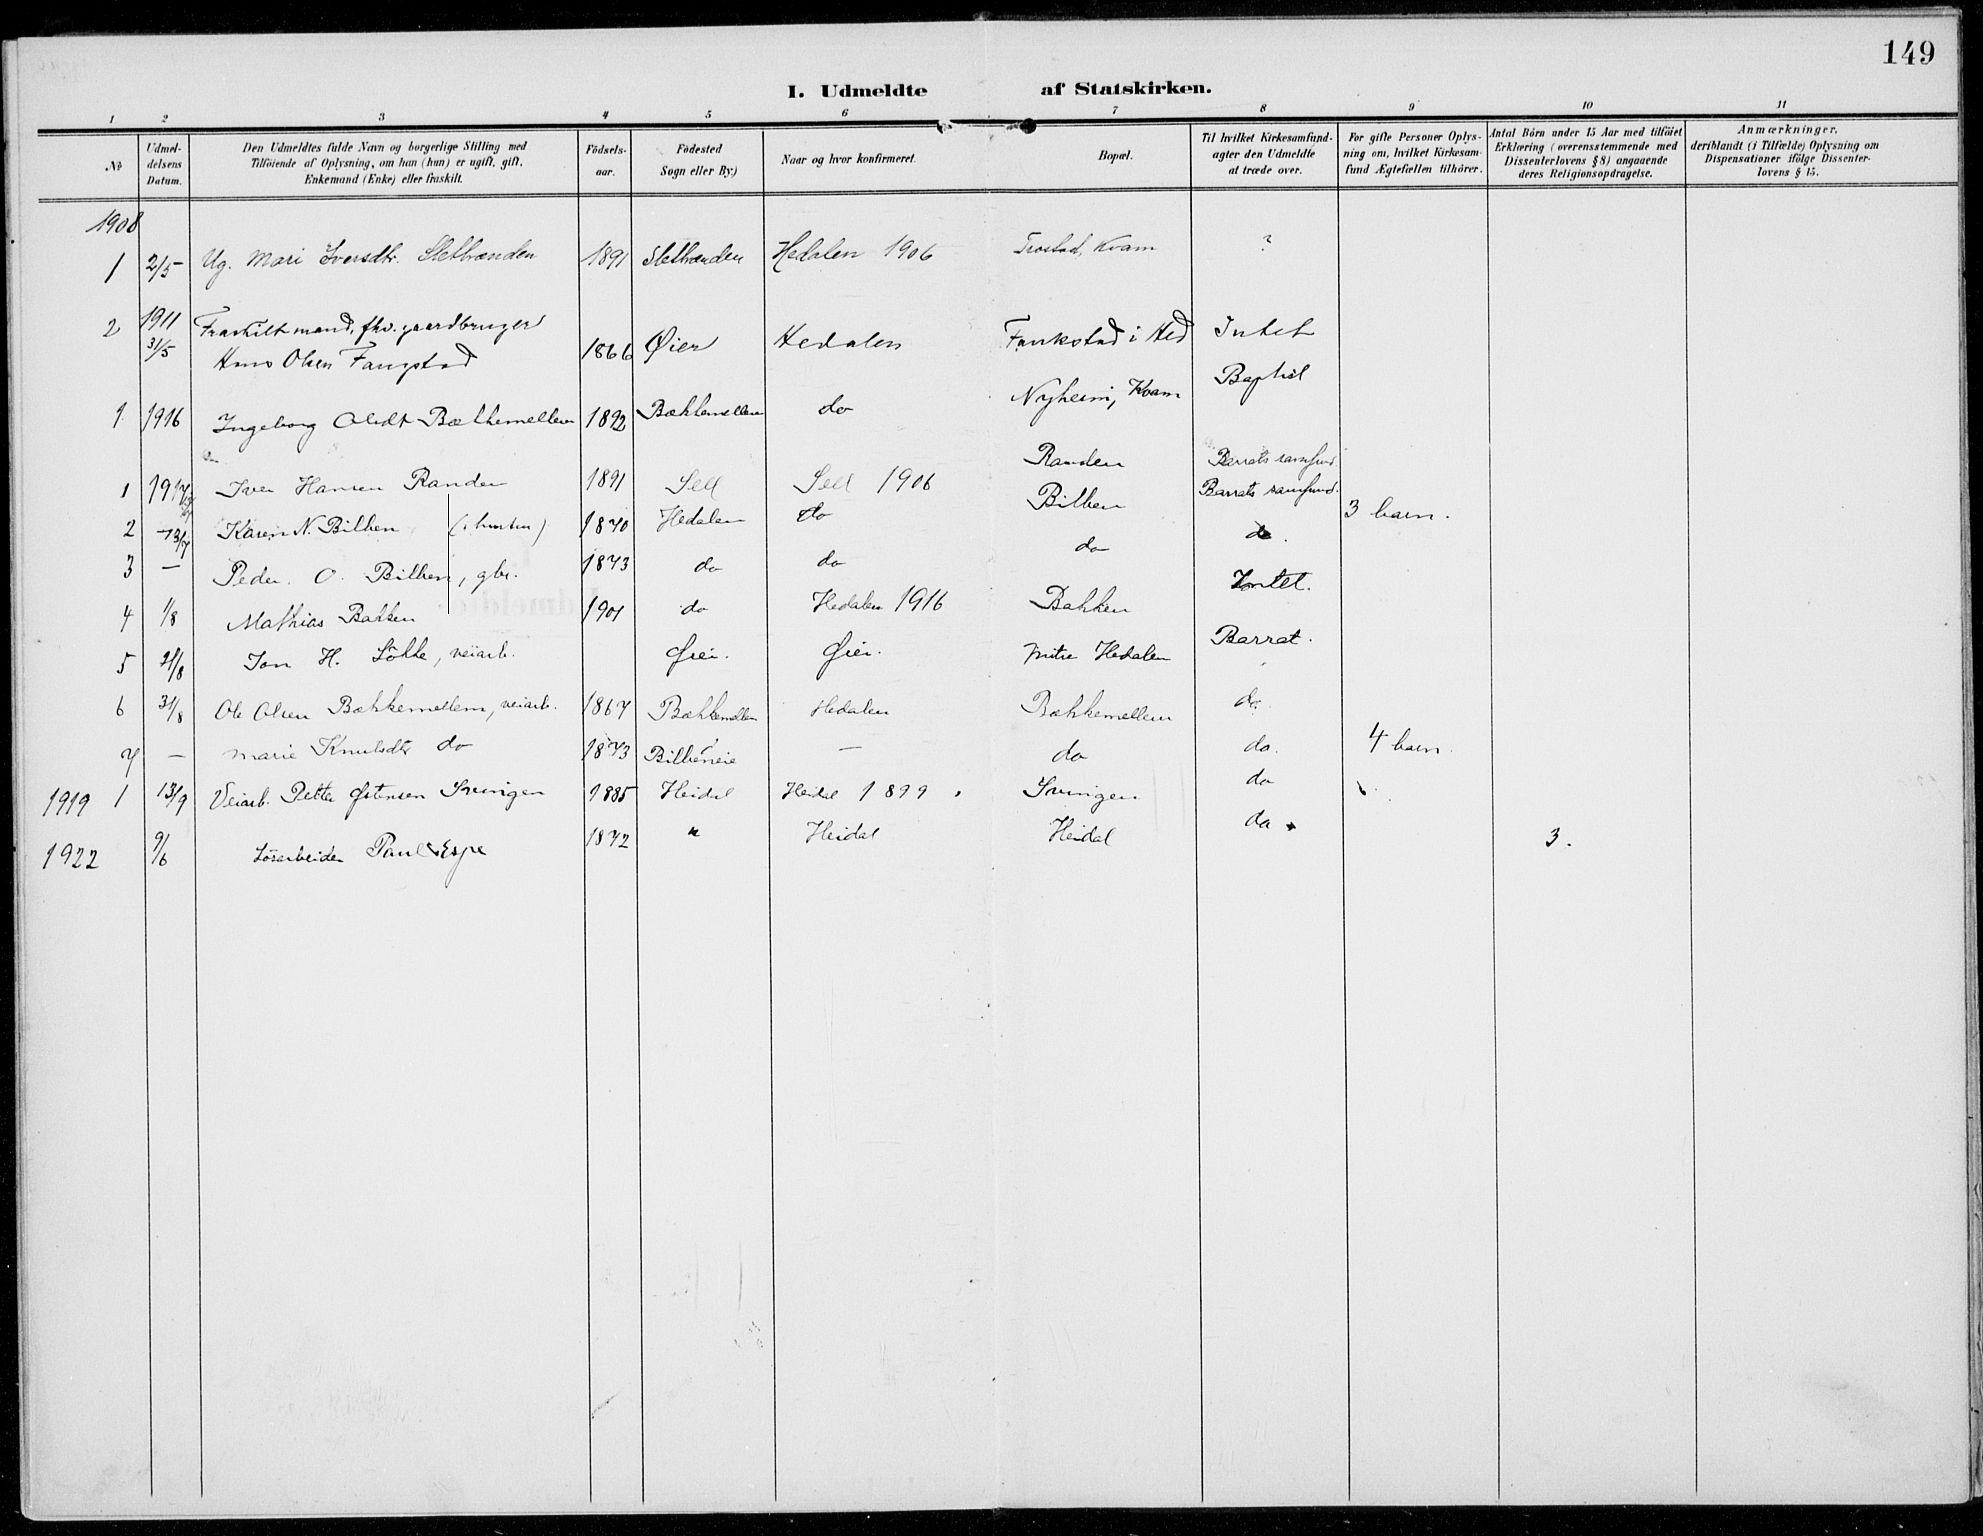 SAH, Sel prestekontor, Ministerialbok nr. 1, 1905-1922, s. 149